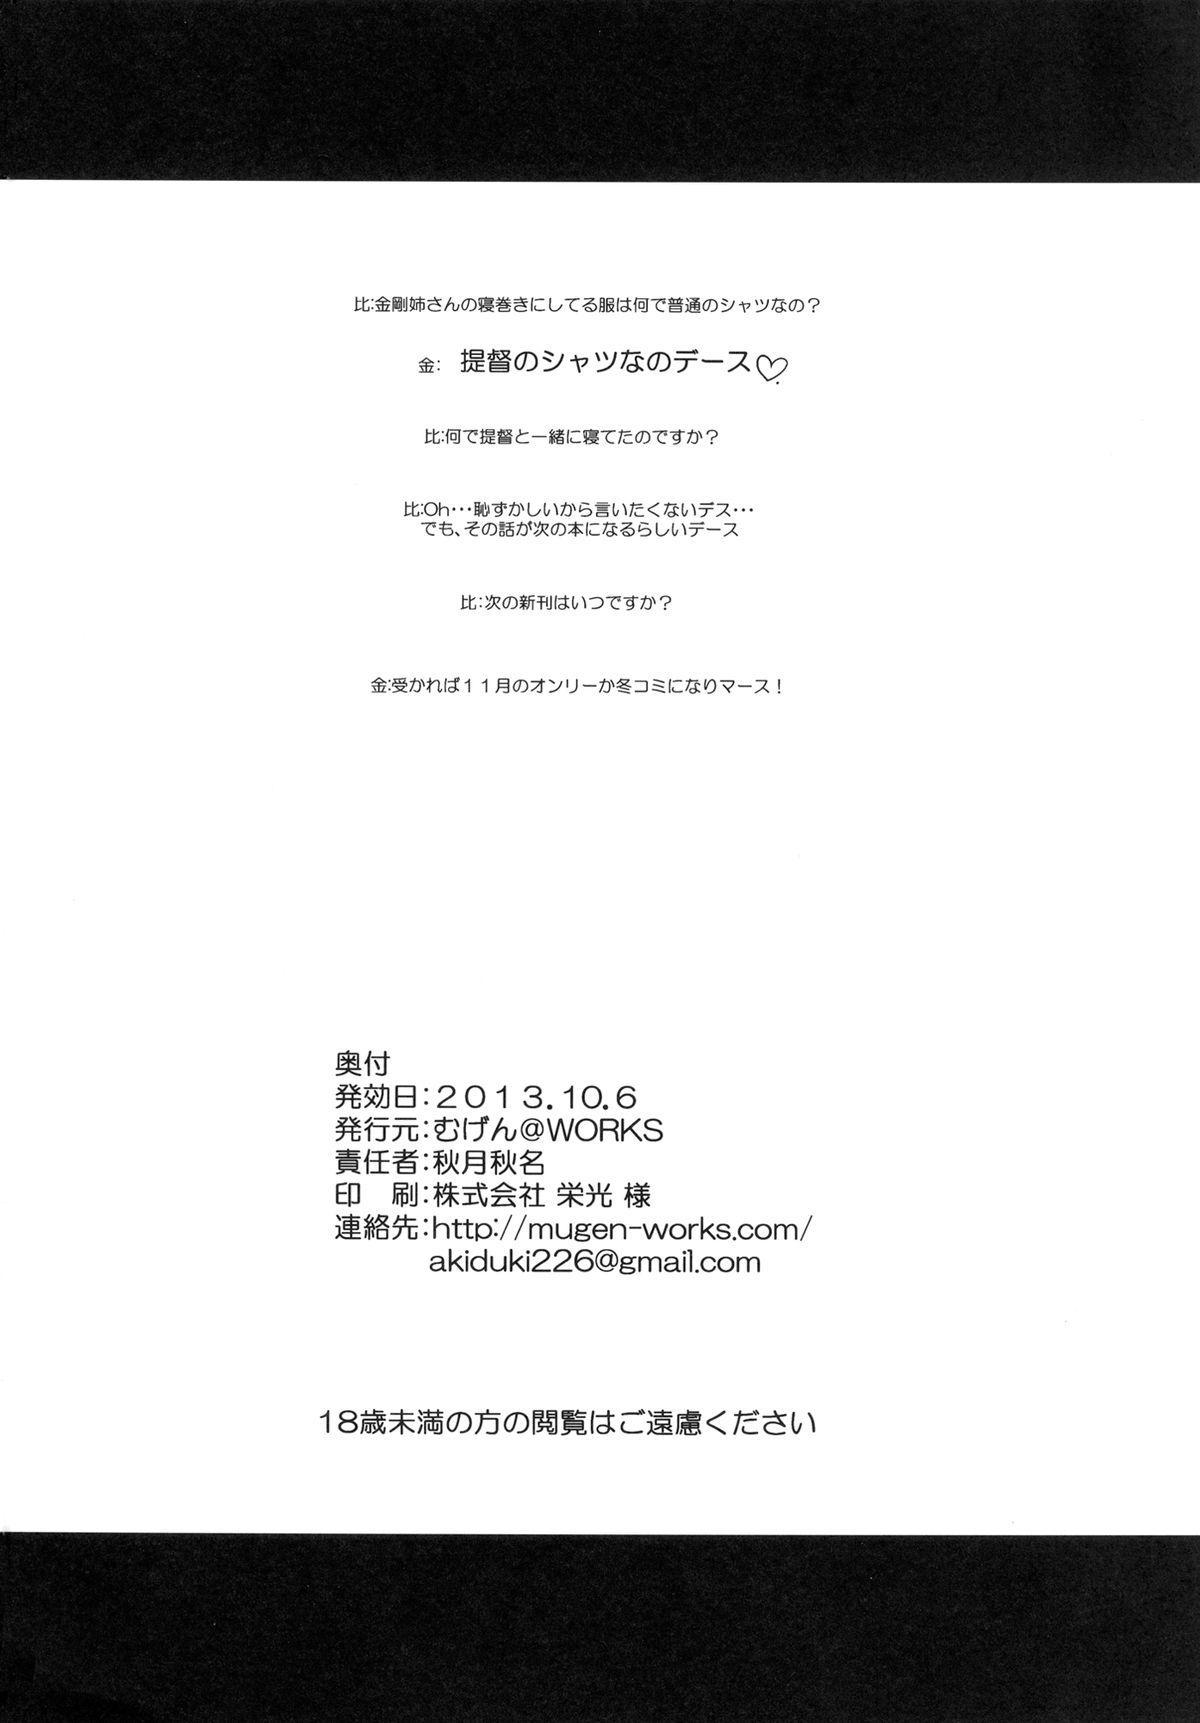 [Mugen@WORKS (Akiduki Akina)] Kongou Icha Colle - KON-COLLE 02 (Kantai Collection -KanColle-) [English] [Facedesk] [Digital] 25